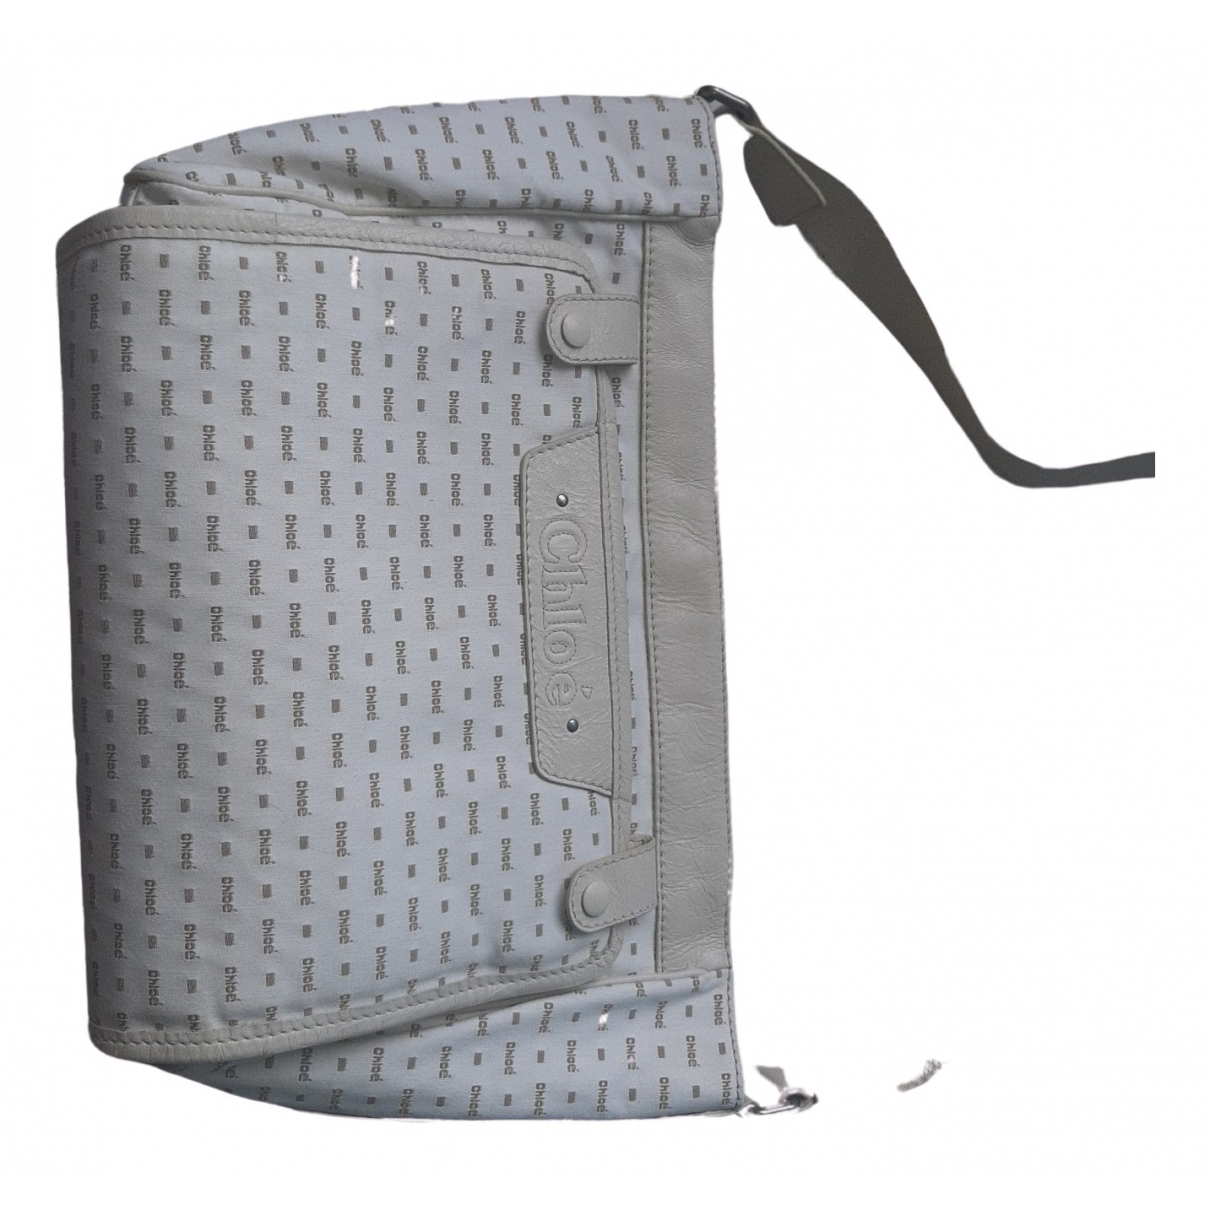 Chloé \N Beige Leather bag & Pencil cases for Kids \N